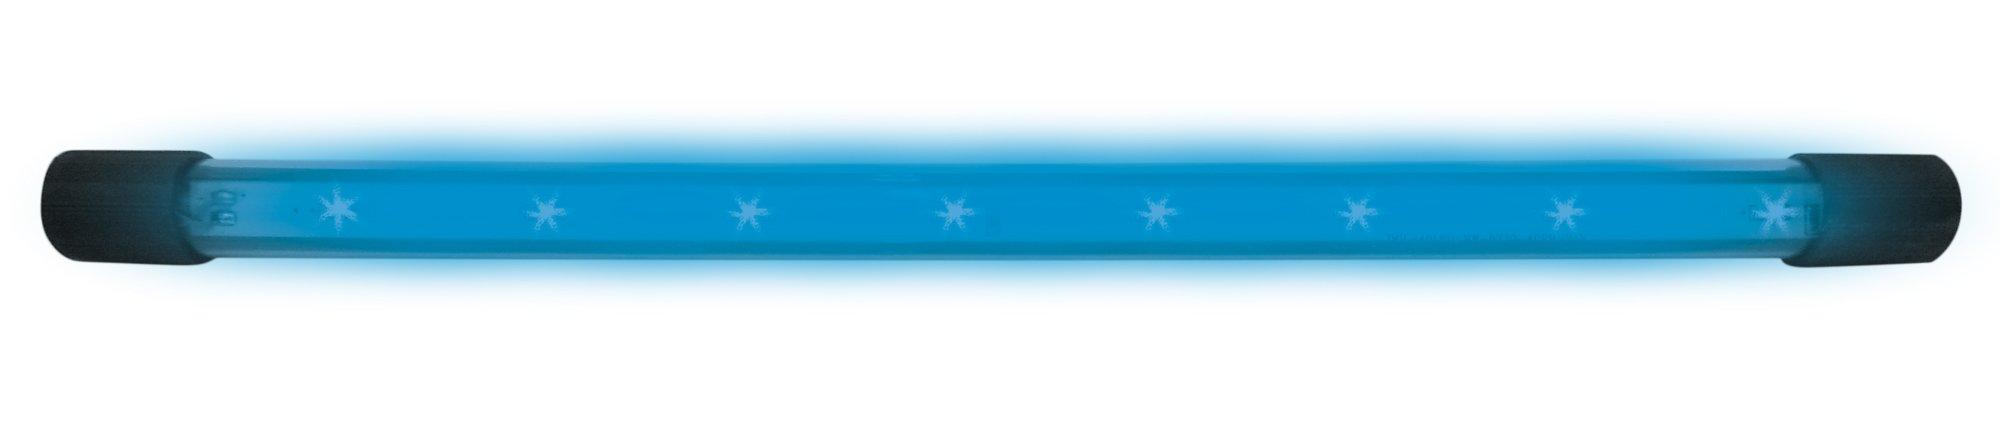 Tubo a led per acquario luce blu for Luce per tartarughe